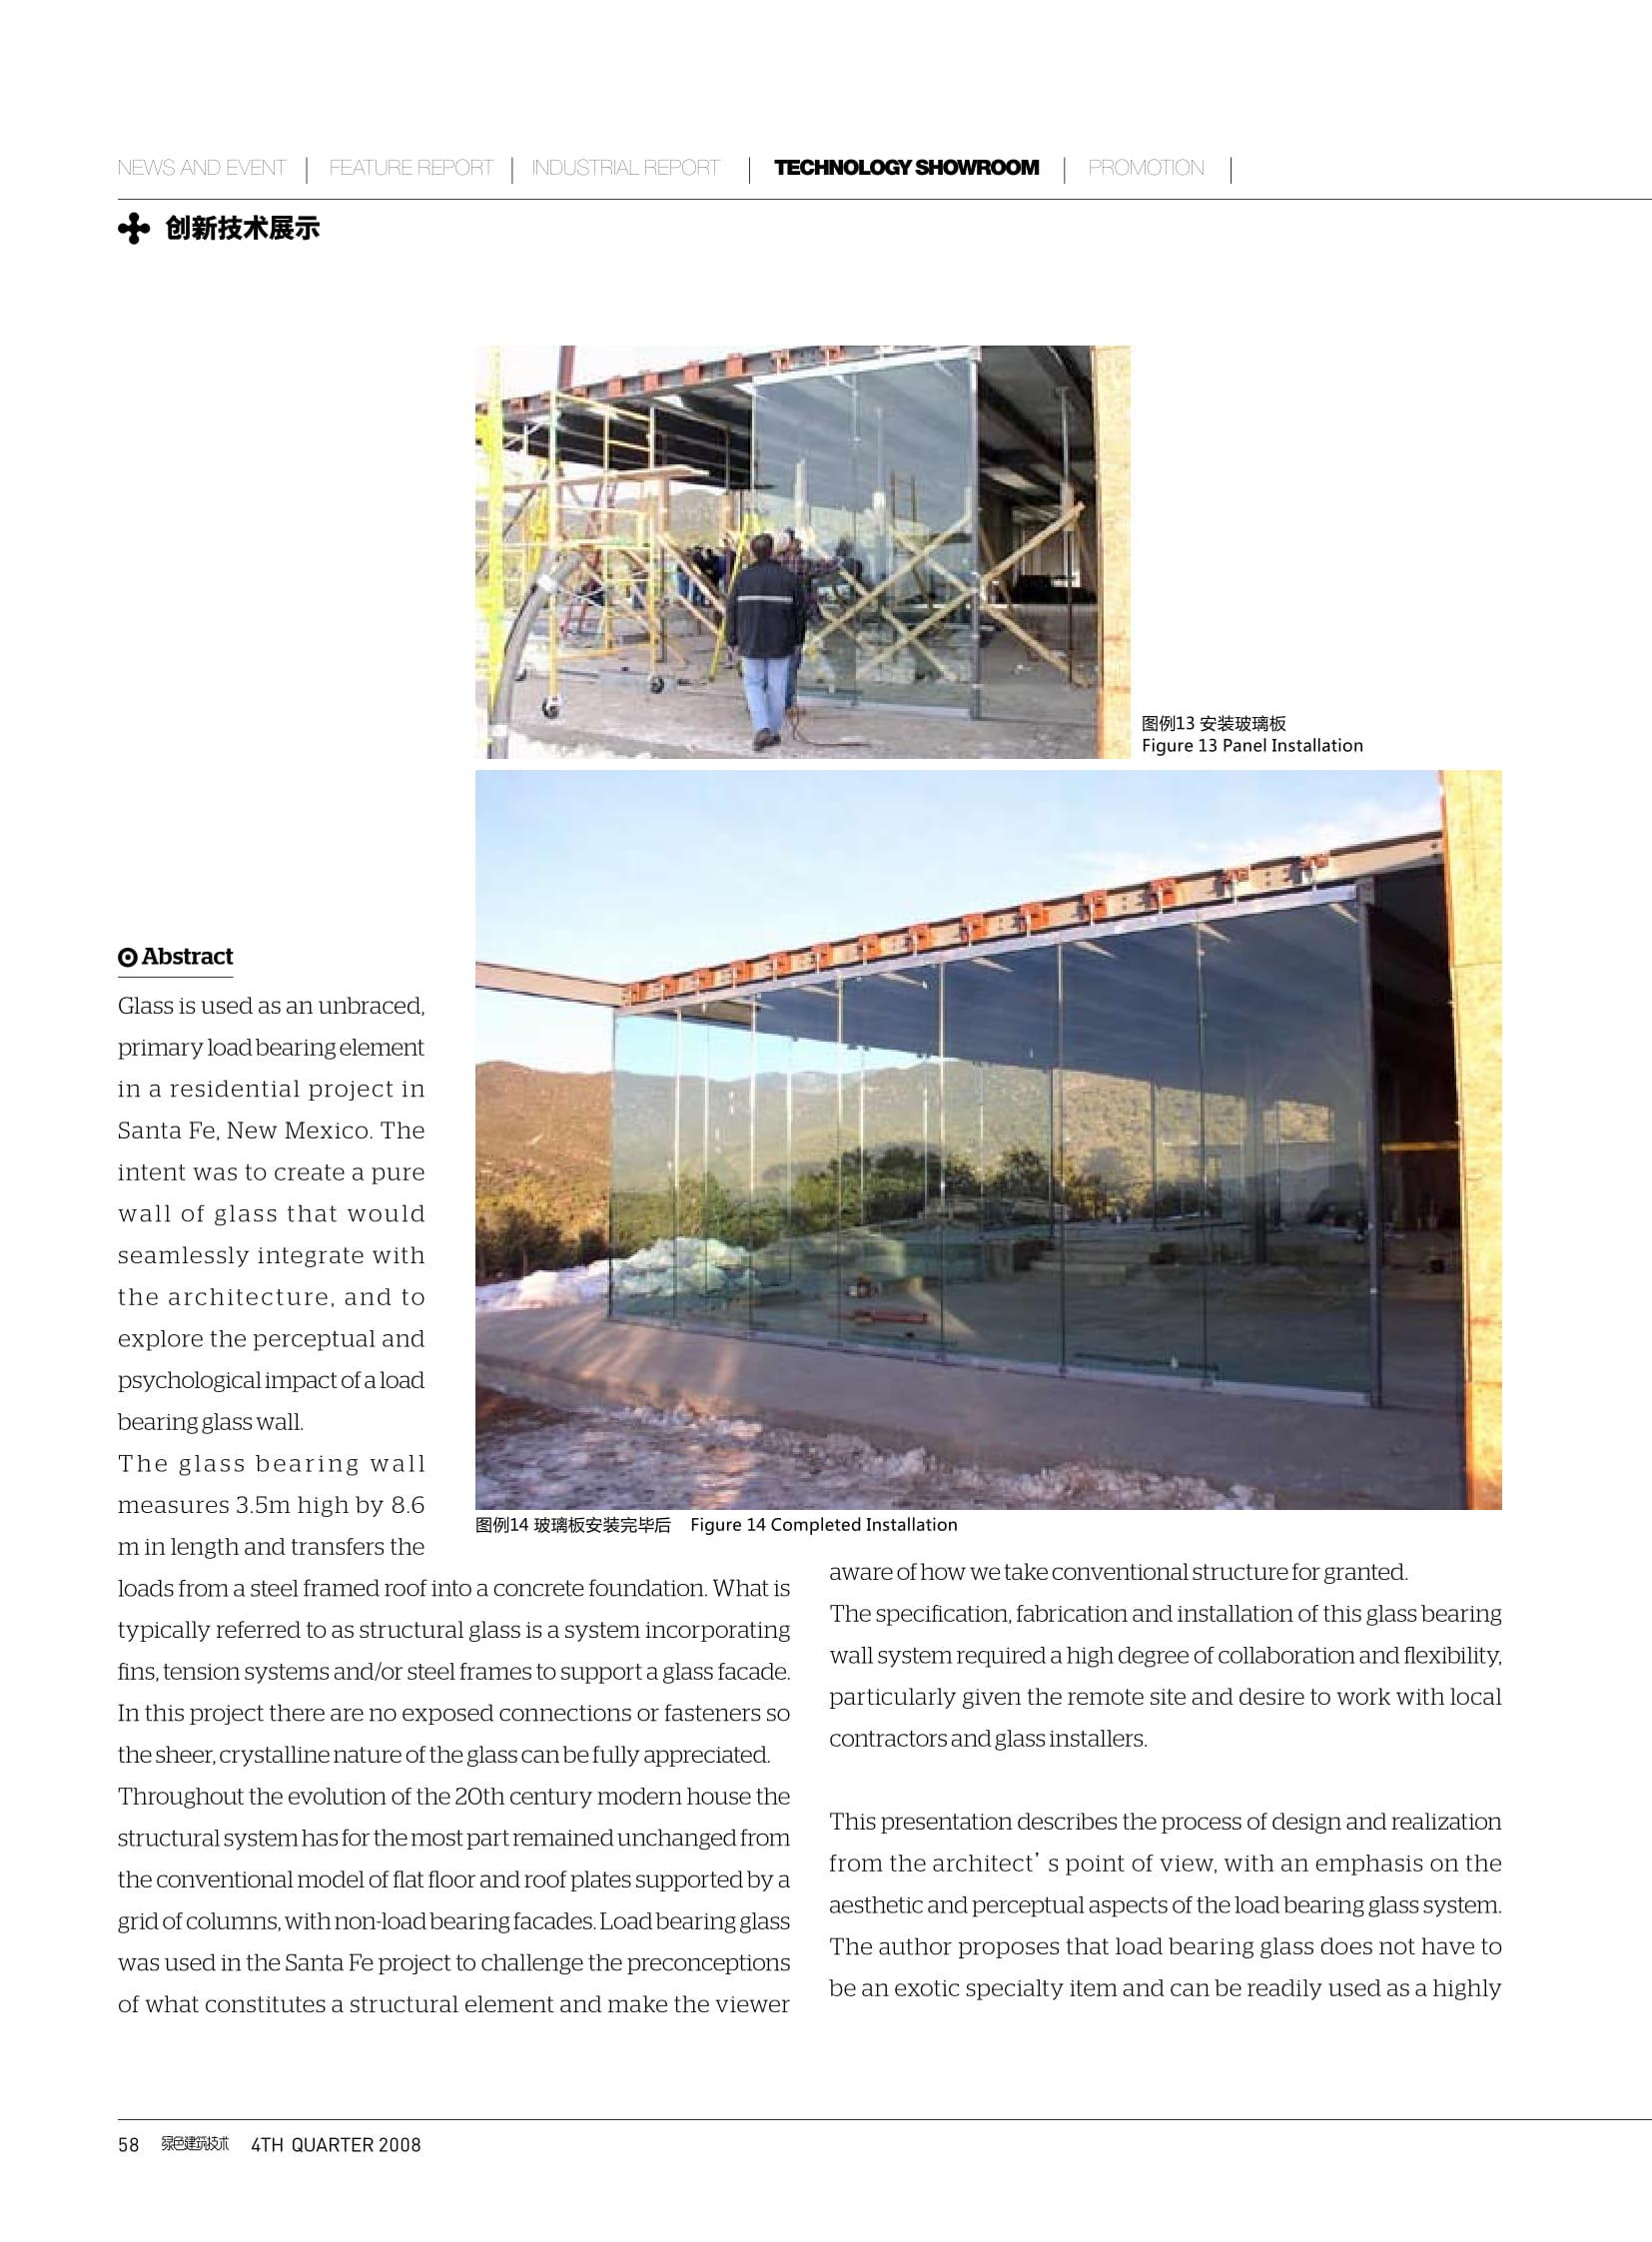 DuBois+Santa+Fe+IGA+Glass+Bearing+Wall-07.jpg